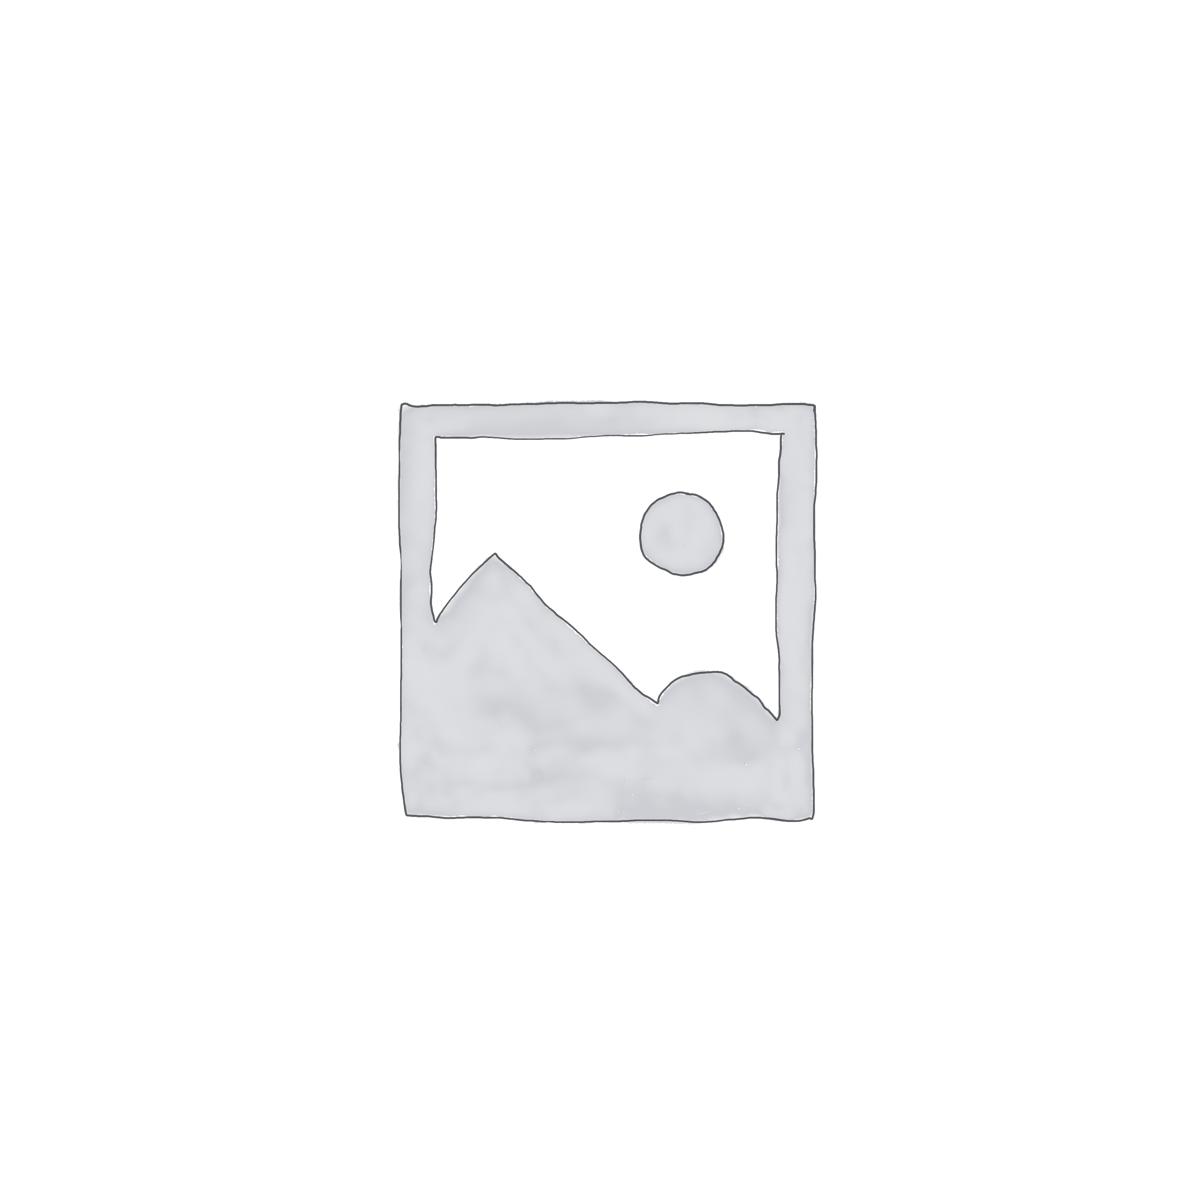 3D Embossed Look Tulip Floral with Swan Wallpaper Mural